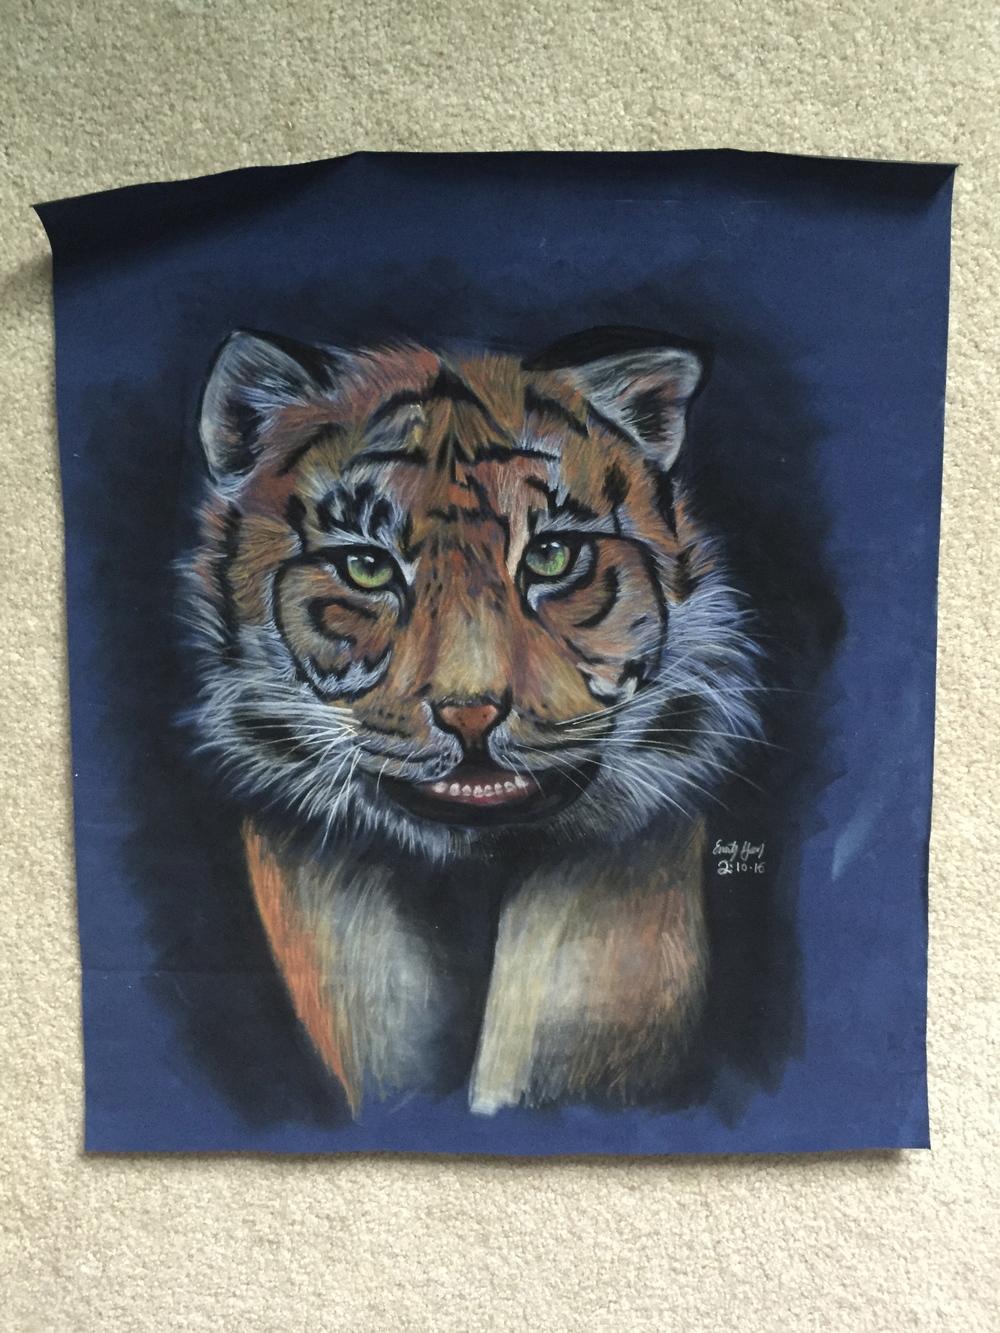 Bryton's Tiger